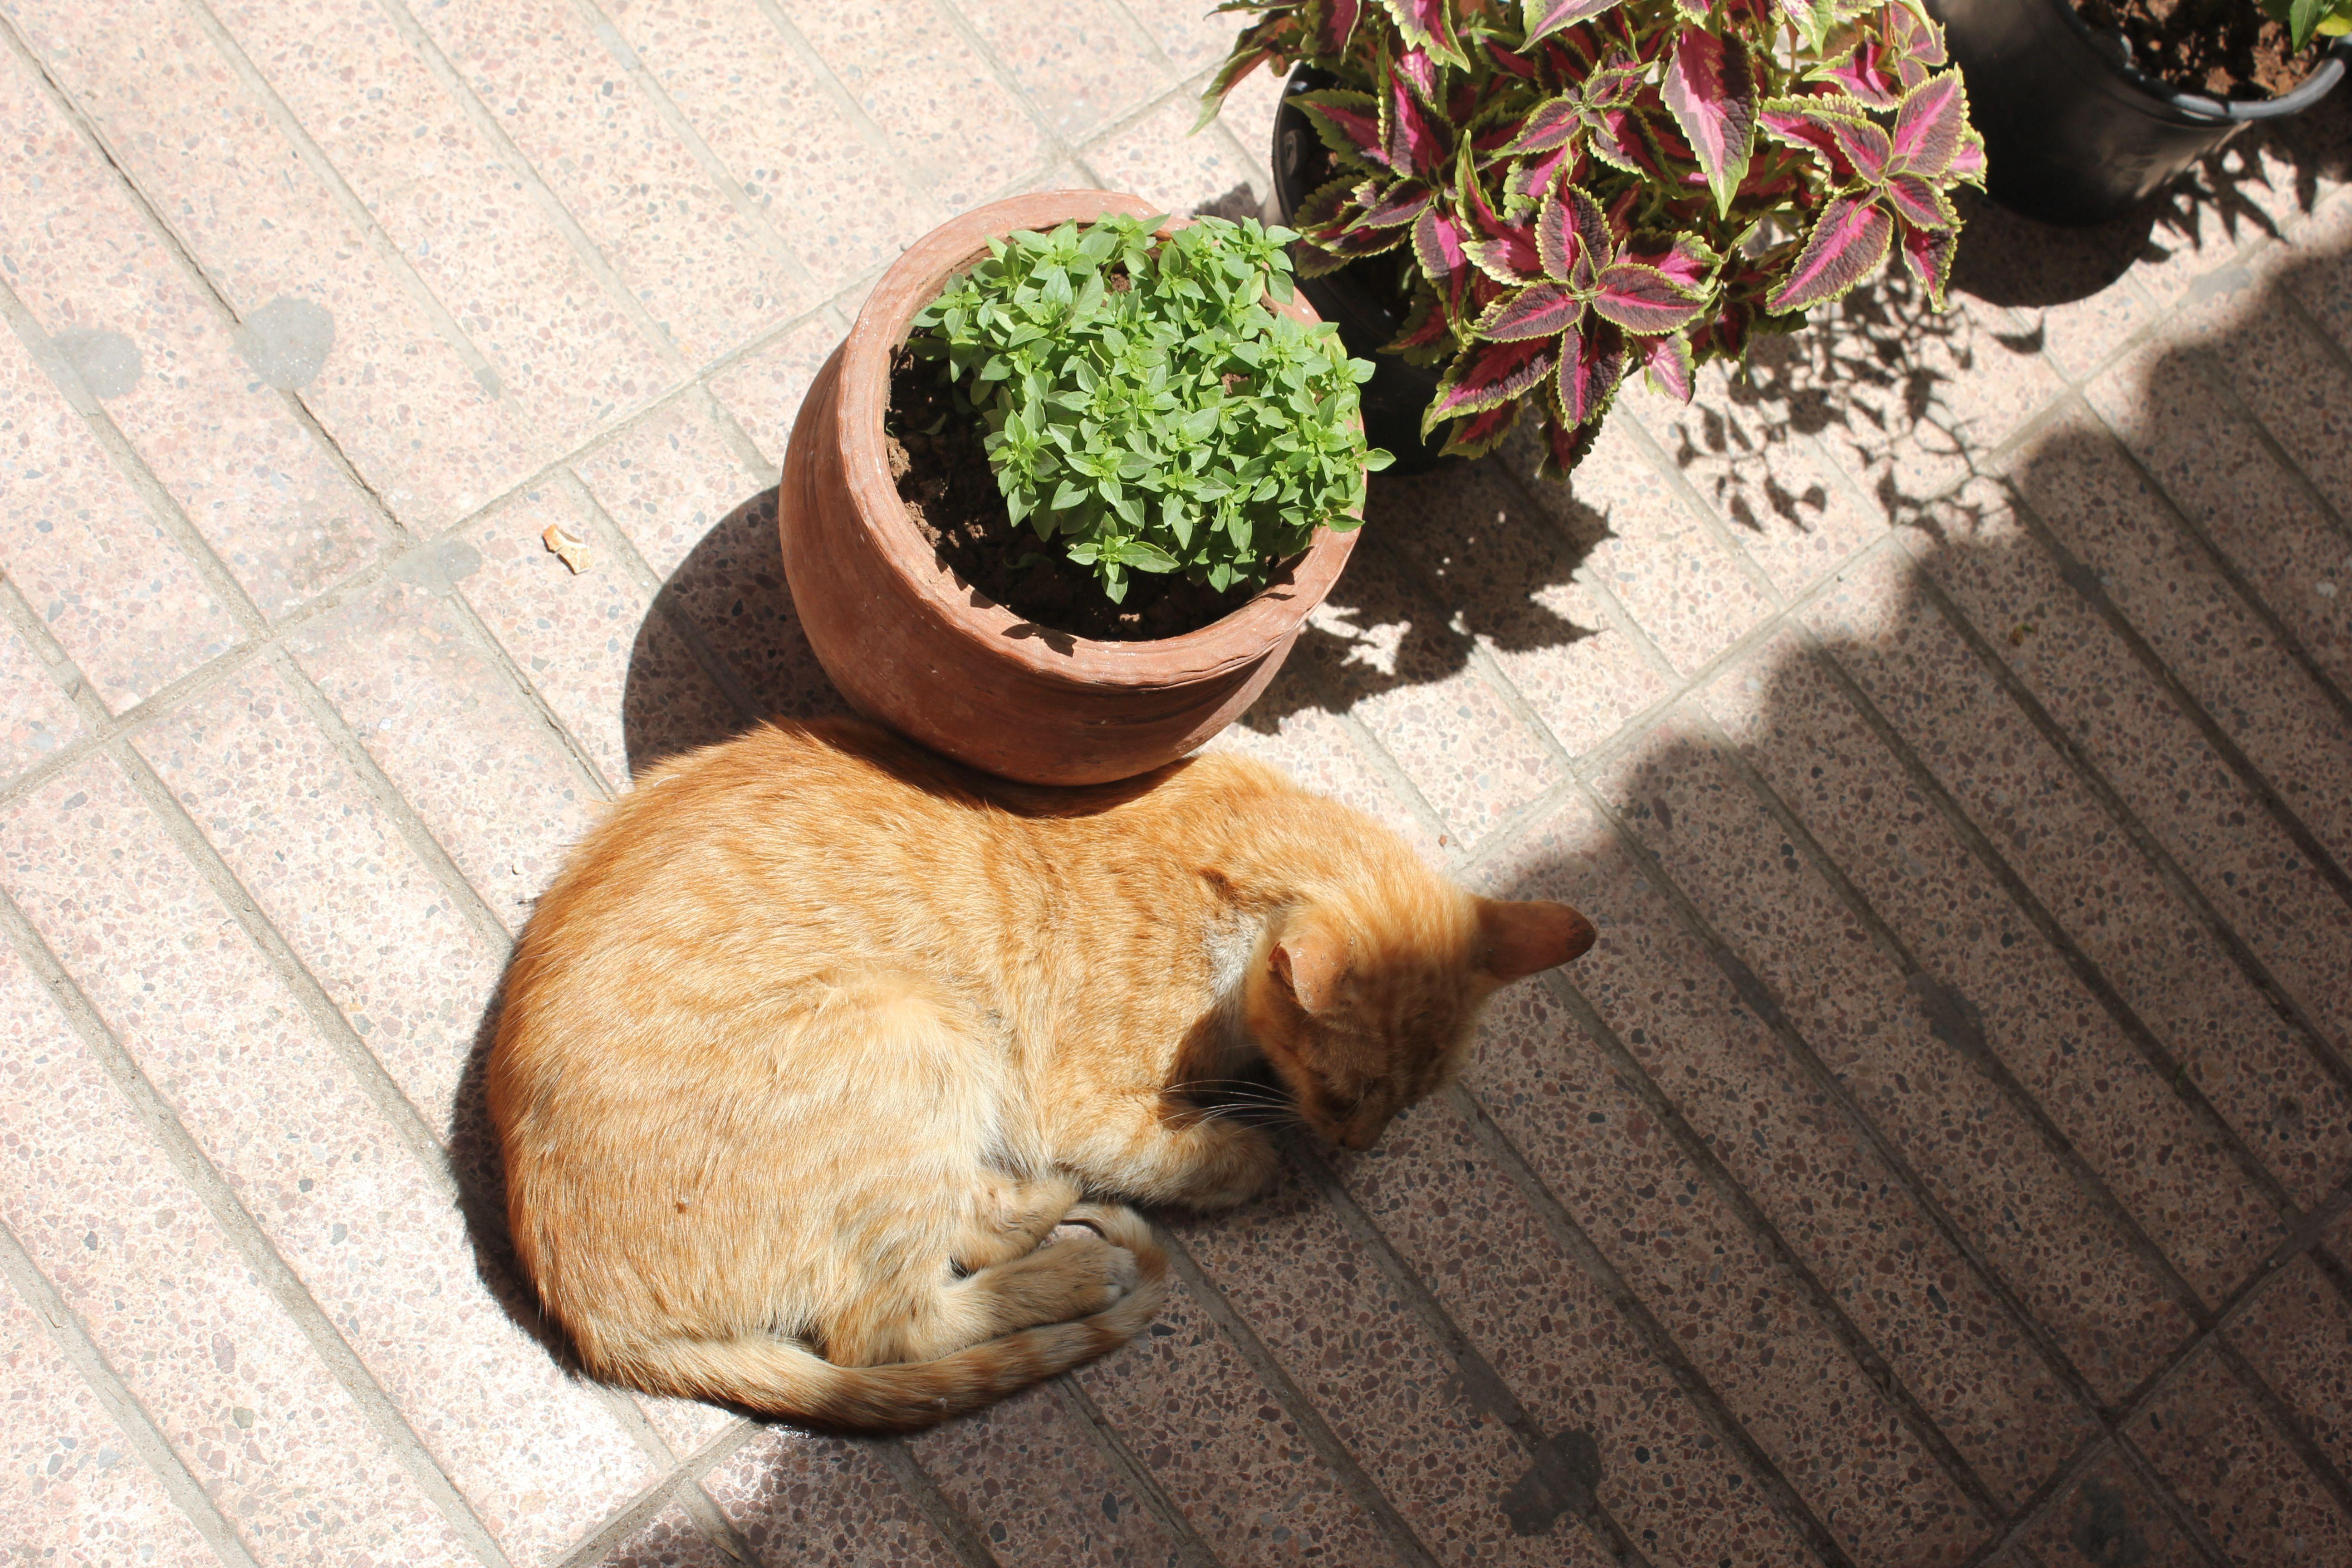 Amongst the plants